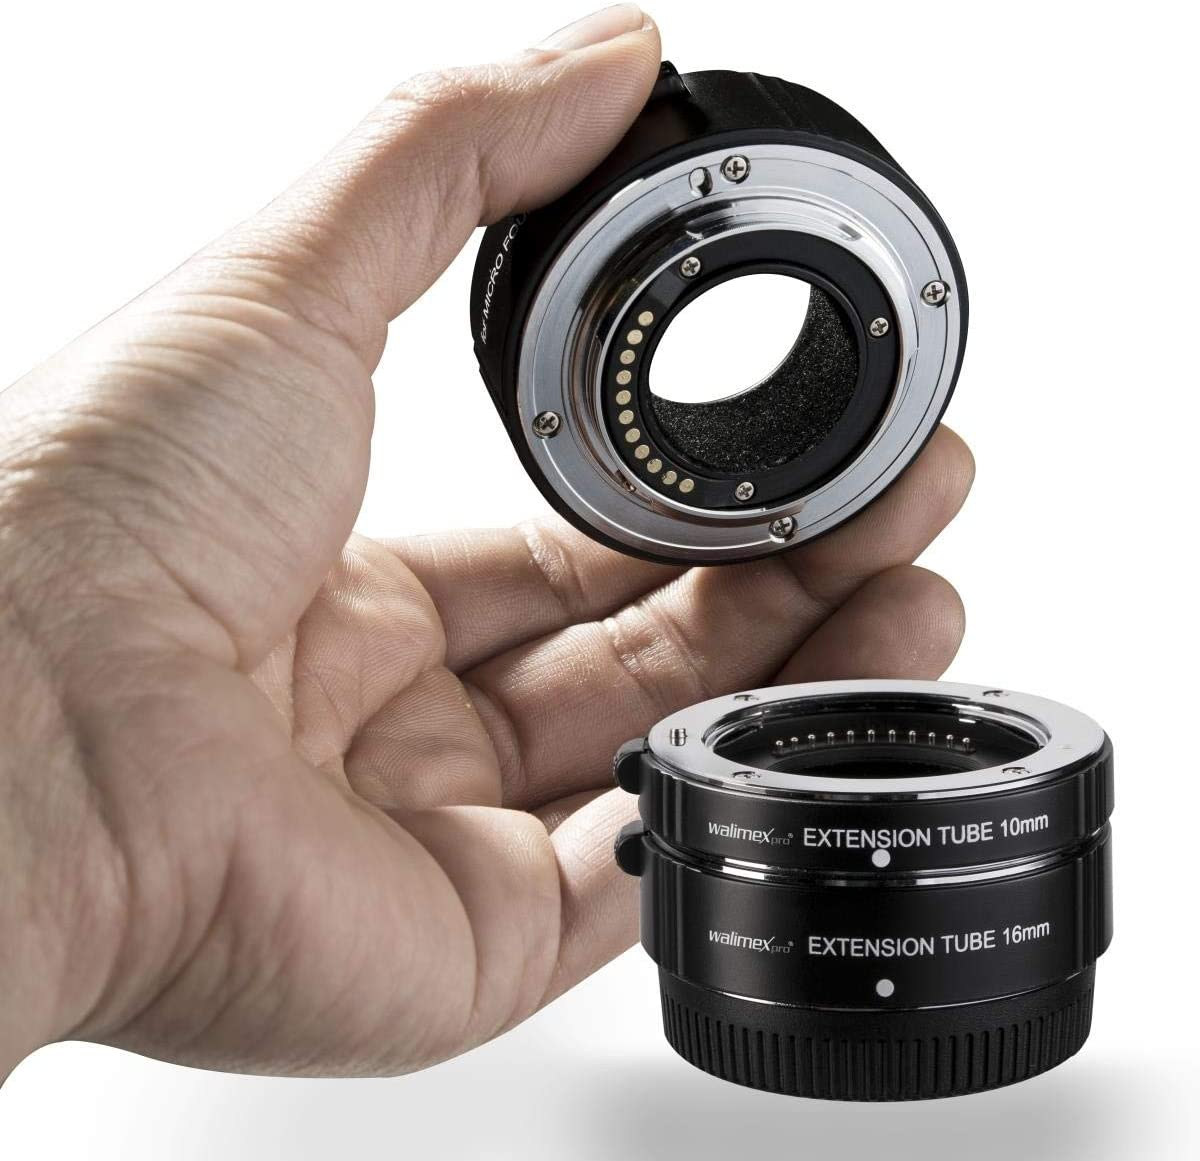 Walimex Pro Automatik Zwischenringsatz Für Fuji X Kamera